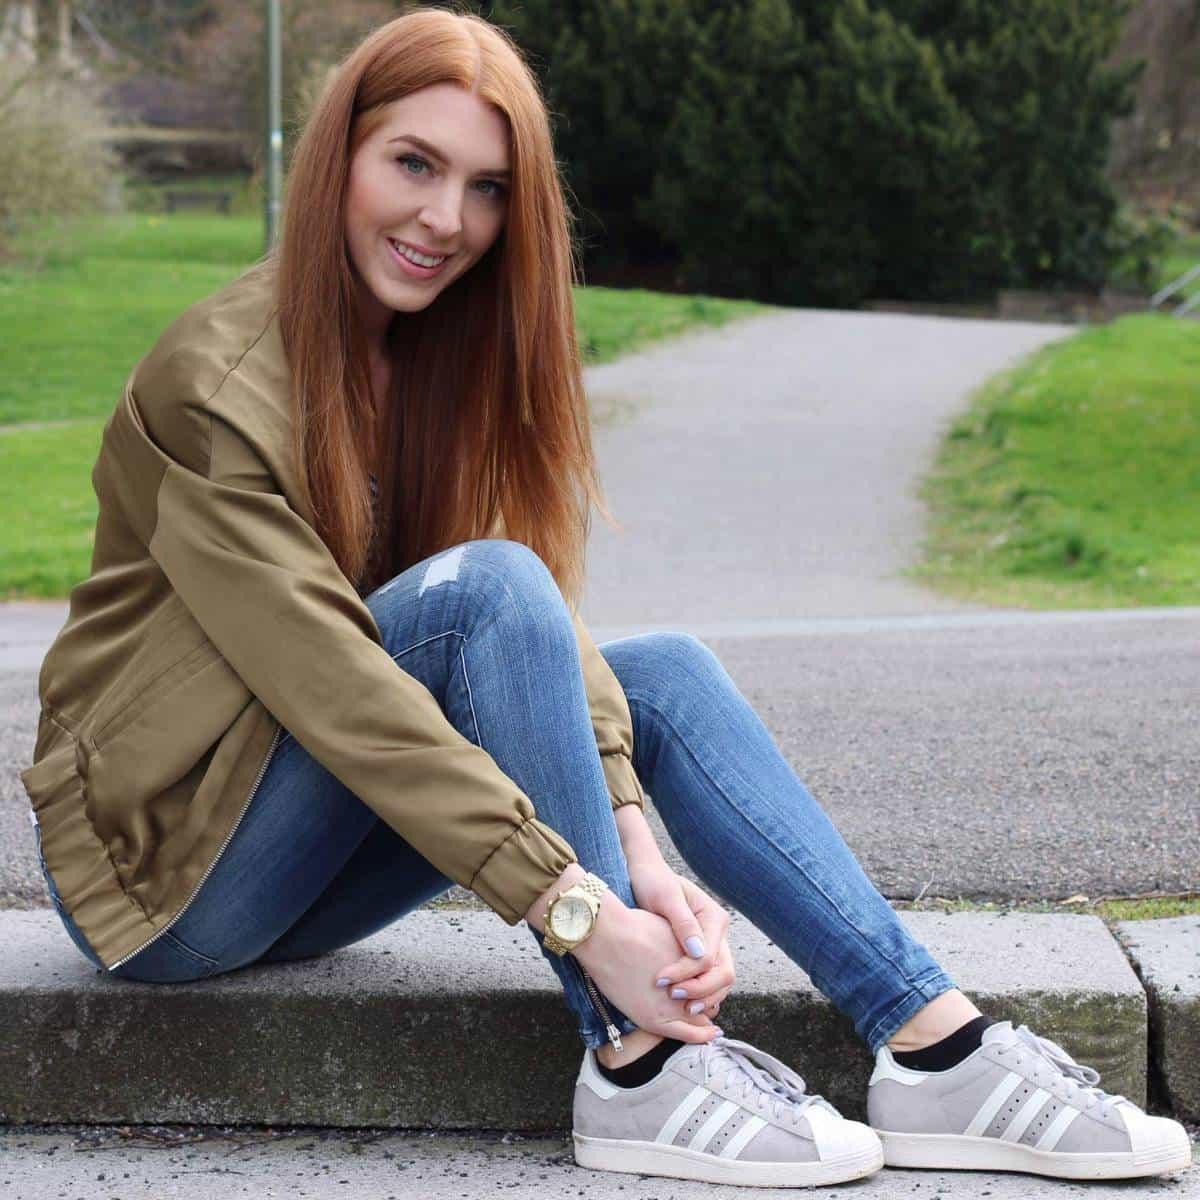 deutsche youtuberinnen nackt